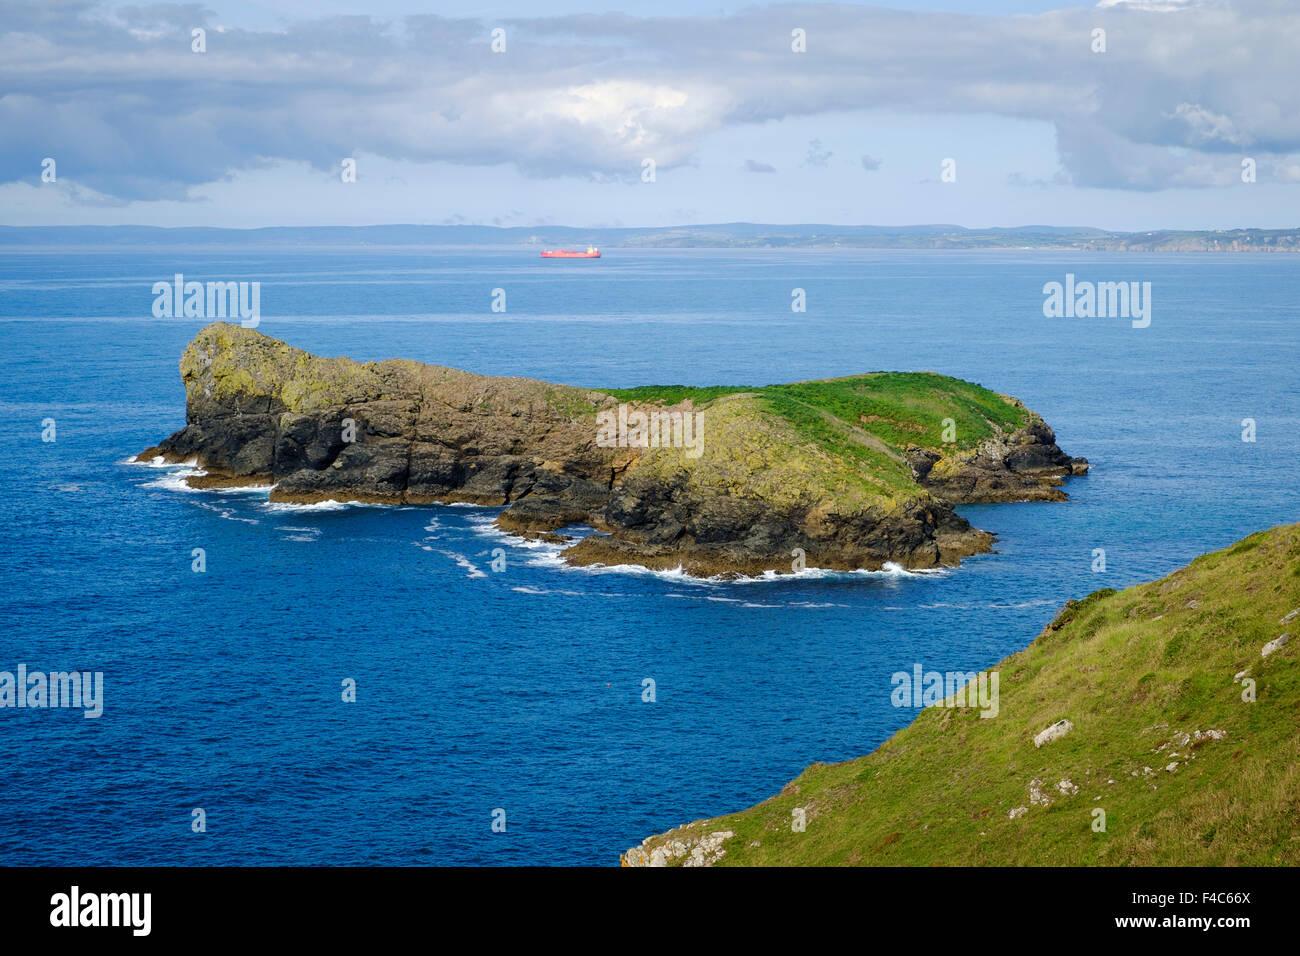 Mullion Insel Bird Sanctuary, Pfosten, Cornwall, England, UK - von der South West Coast path Stockbild